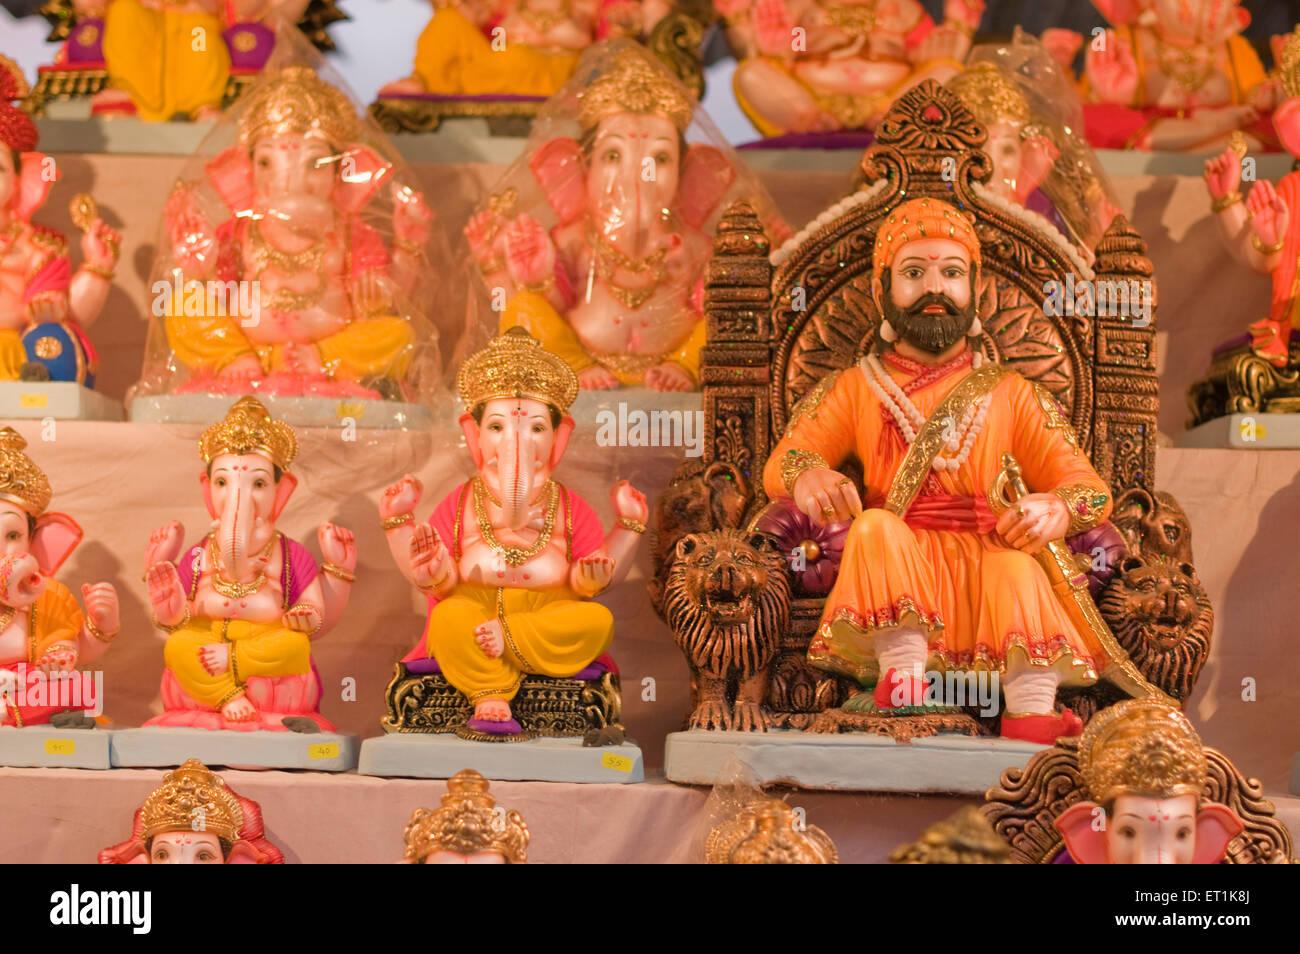 Several idols of Lord Ganesh with Maratha ruler Shivaji Pune Maharashtra India Asia Aug 2011 - Stock Image